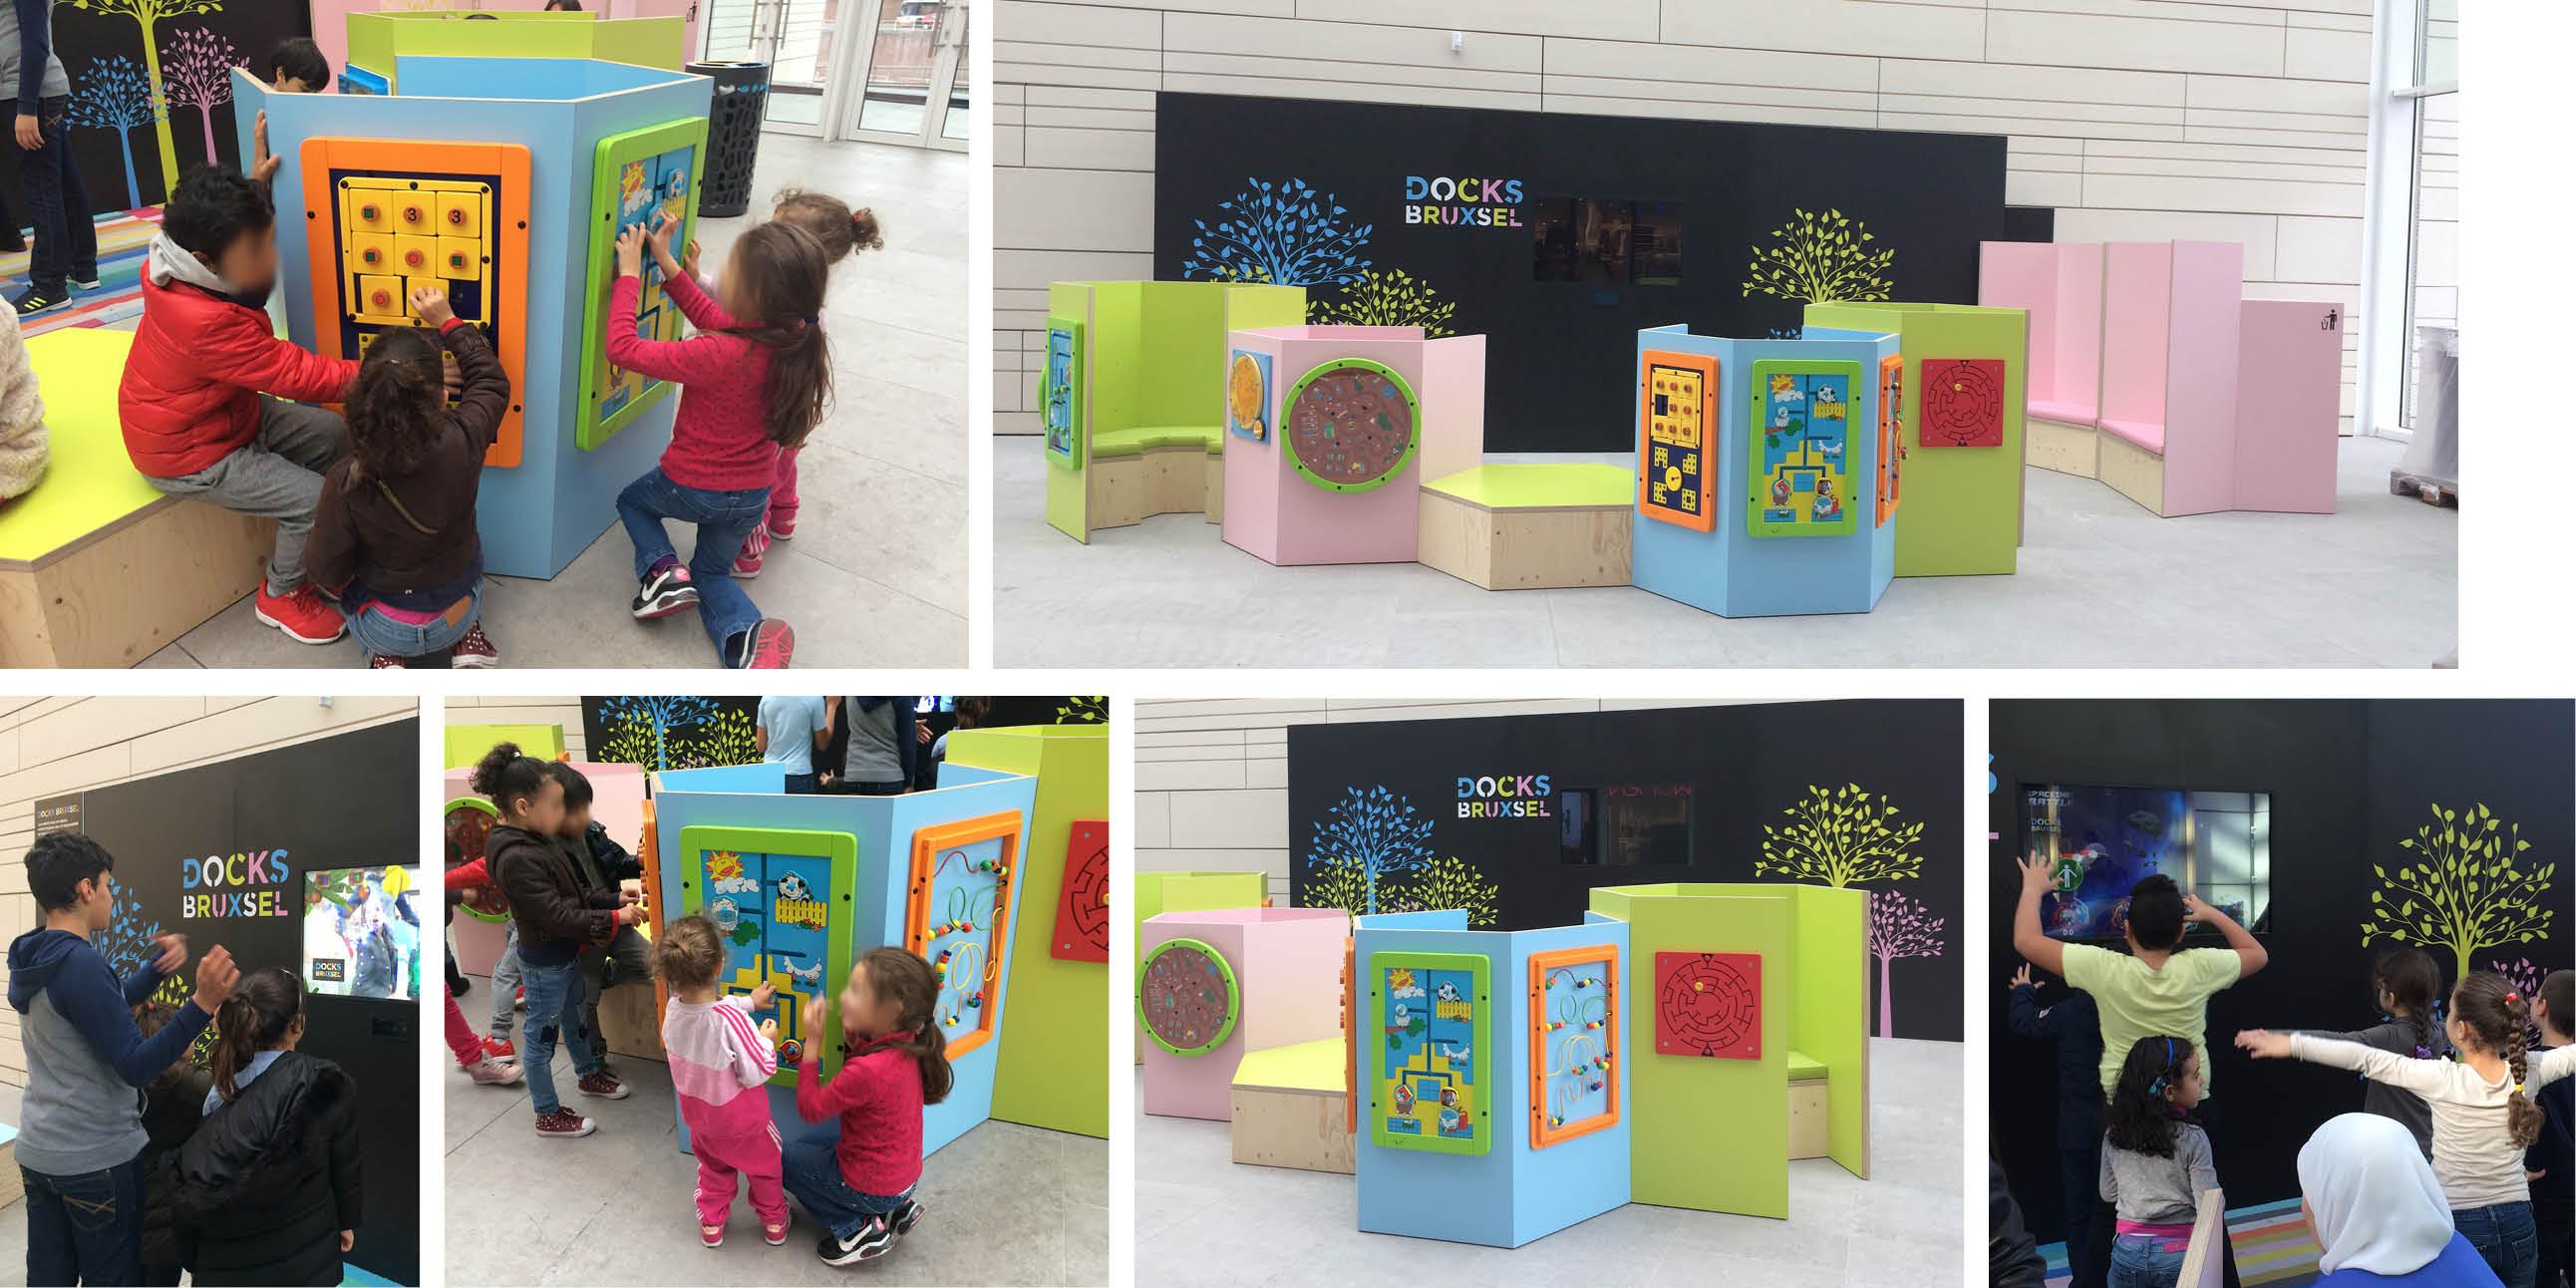 espace enfant centre commercial bruxelles advita. Black Bedroom Furniture Sets. Home Design Ideas